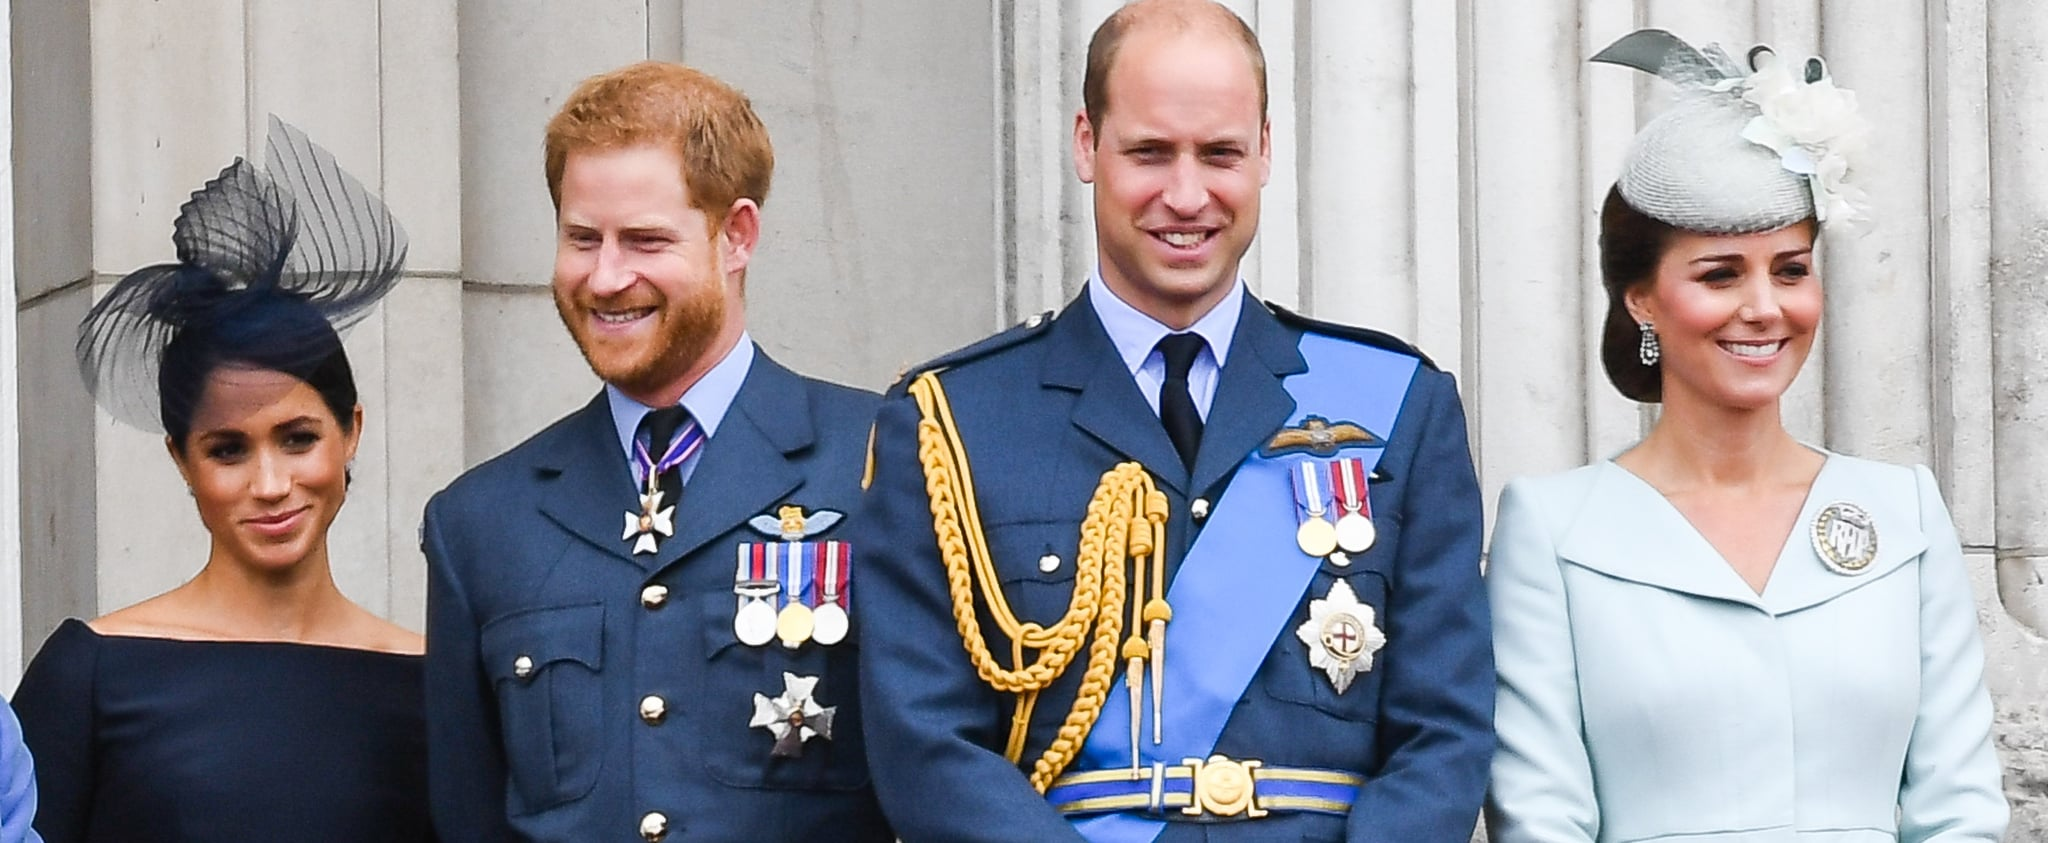 Best British Royal Family Member Poll 2018